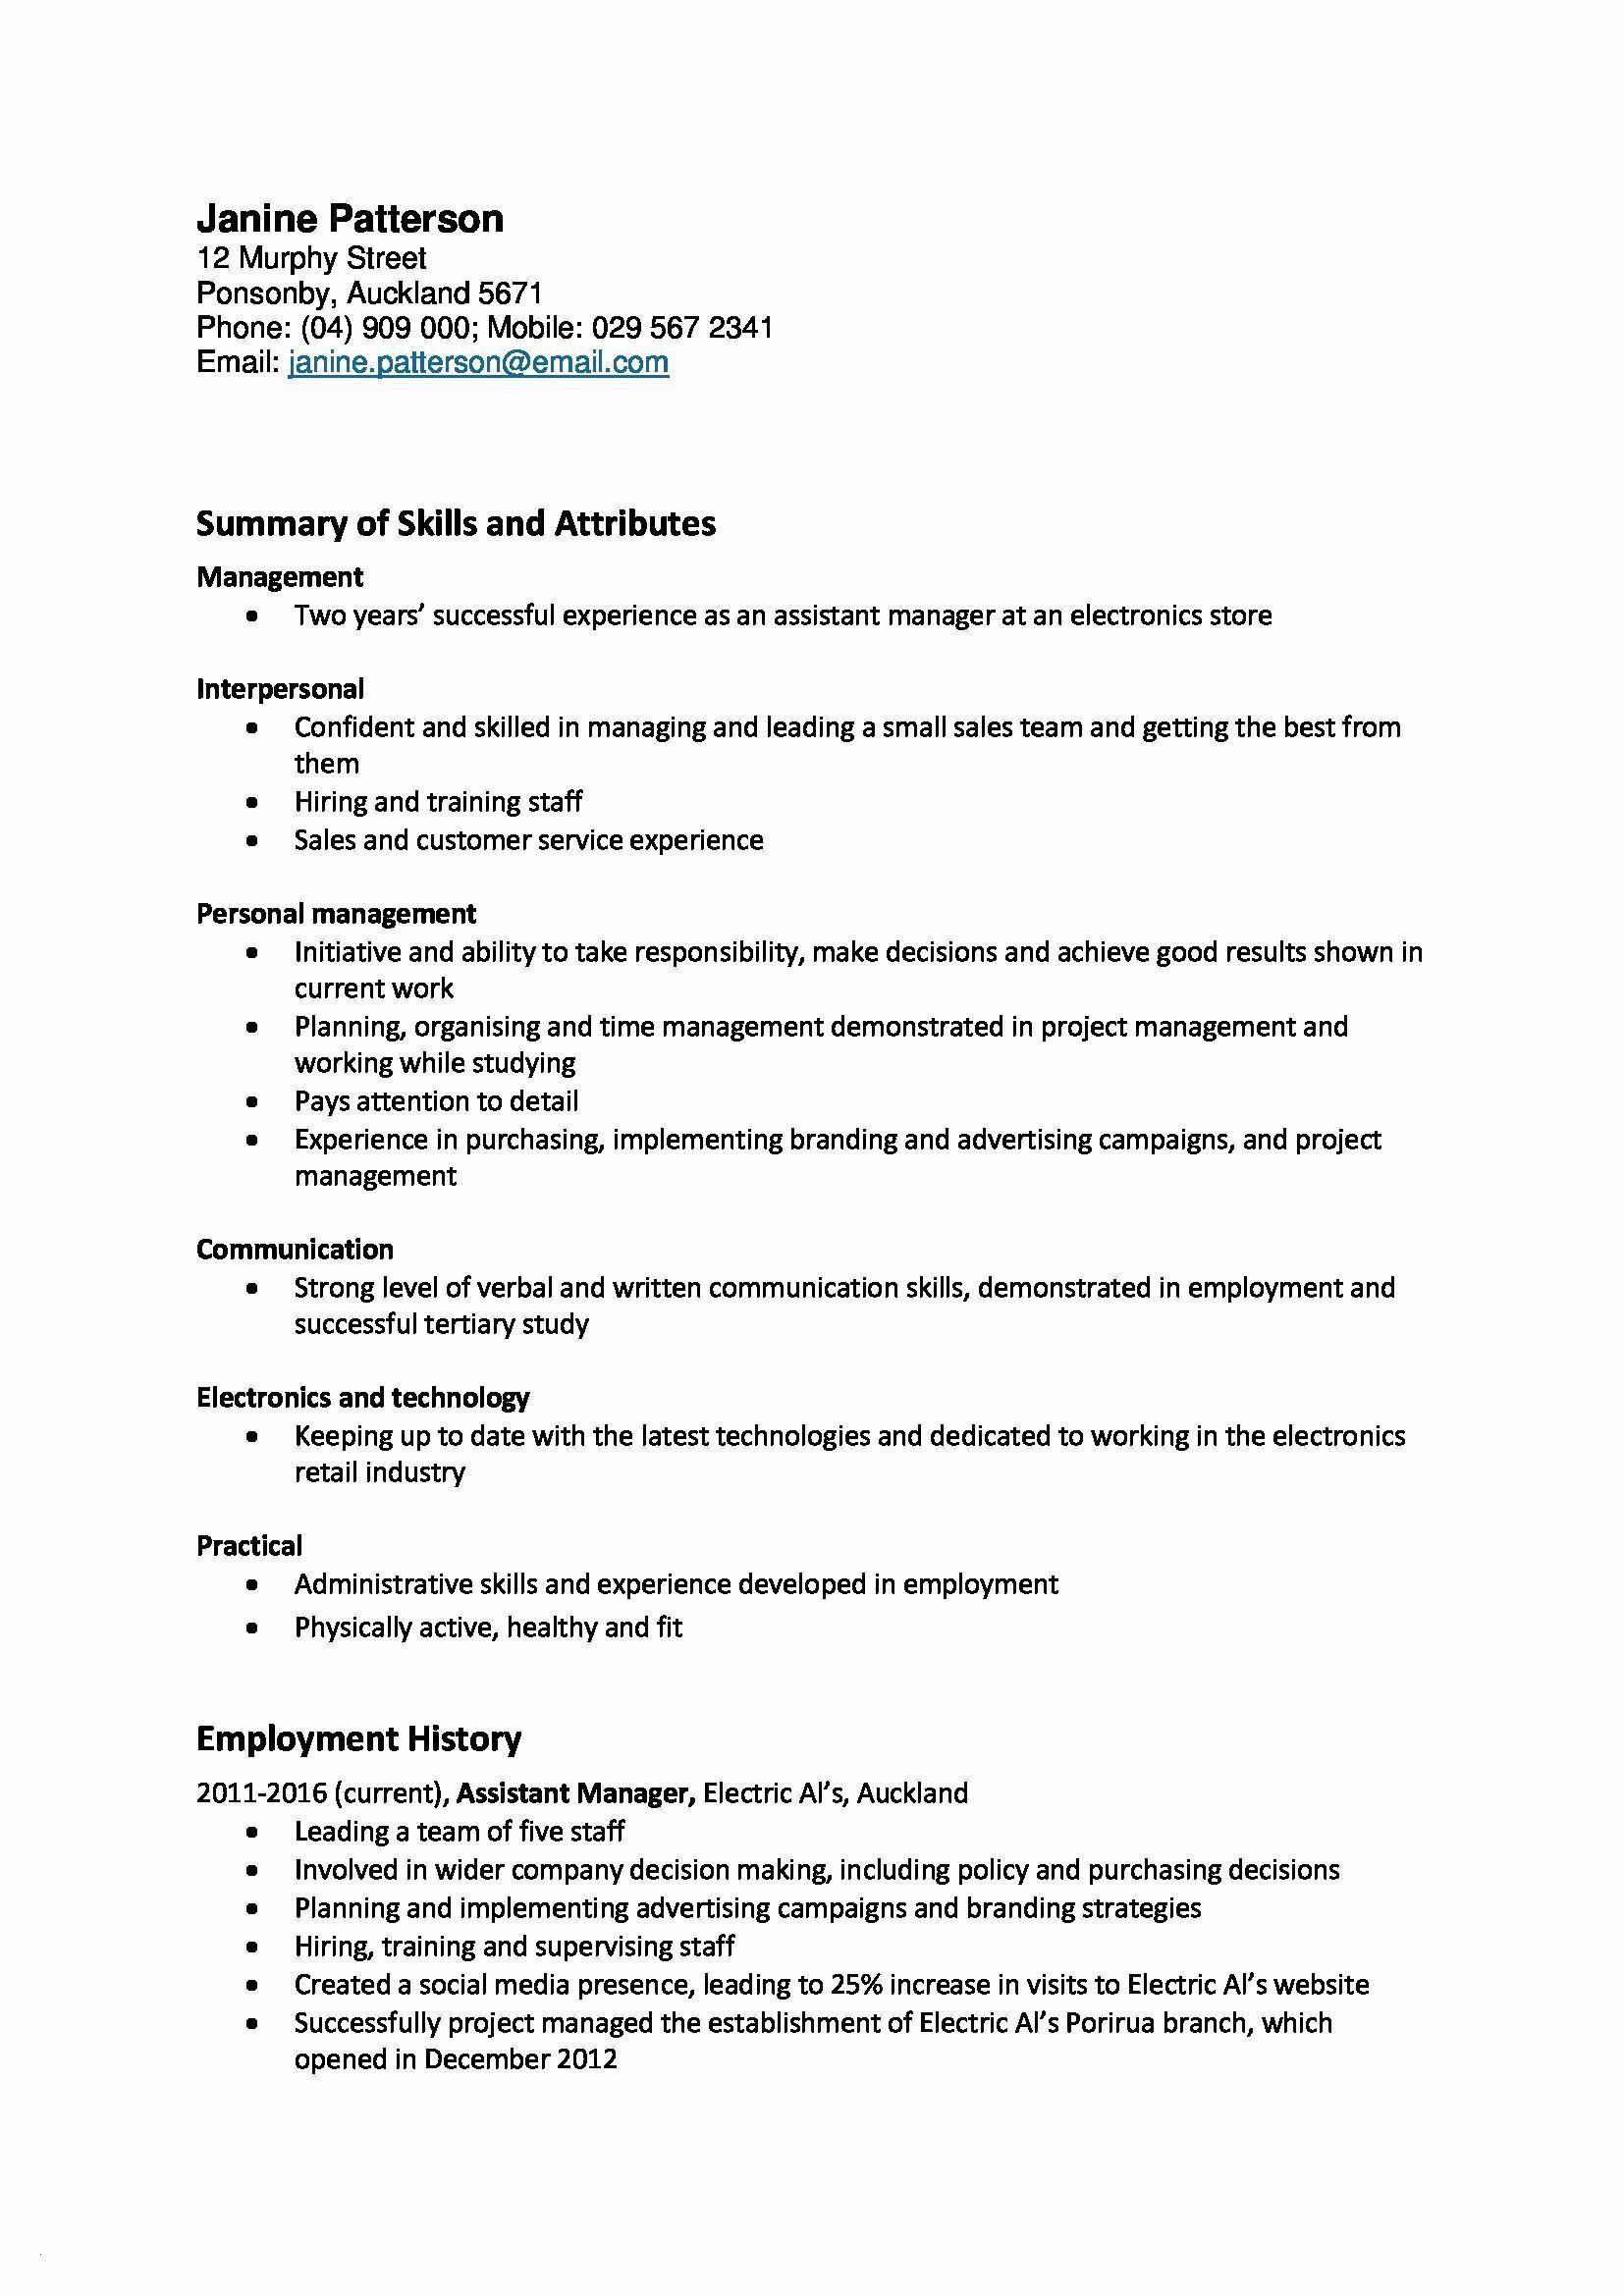 Starbucks Barista Job Description For Resume Elegant Barista Resume Sample Professional Barista Resume Resume Skills Resume Examples Resume Objective Examples